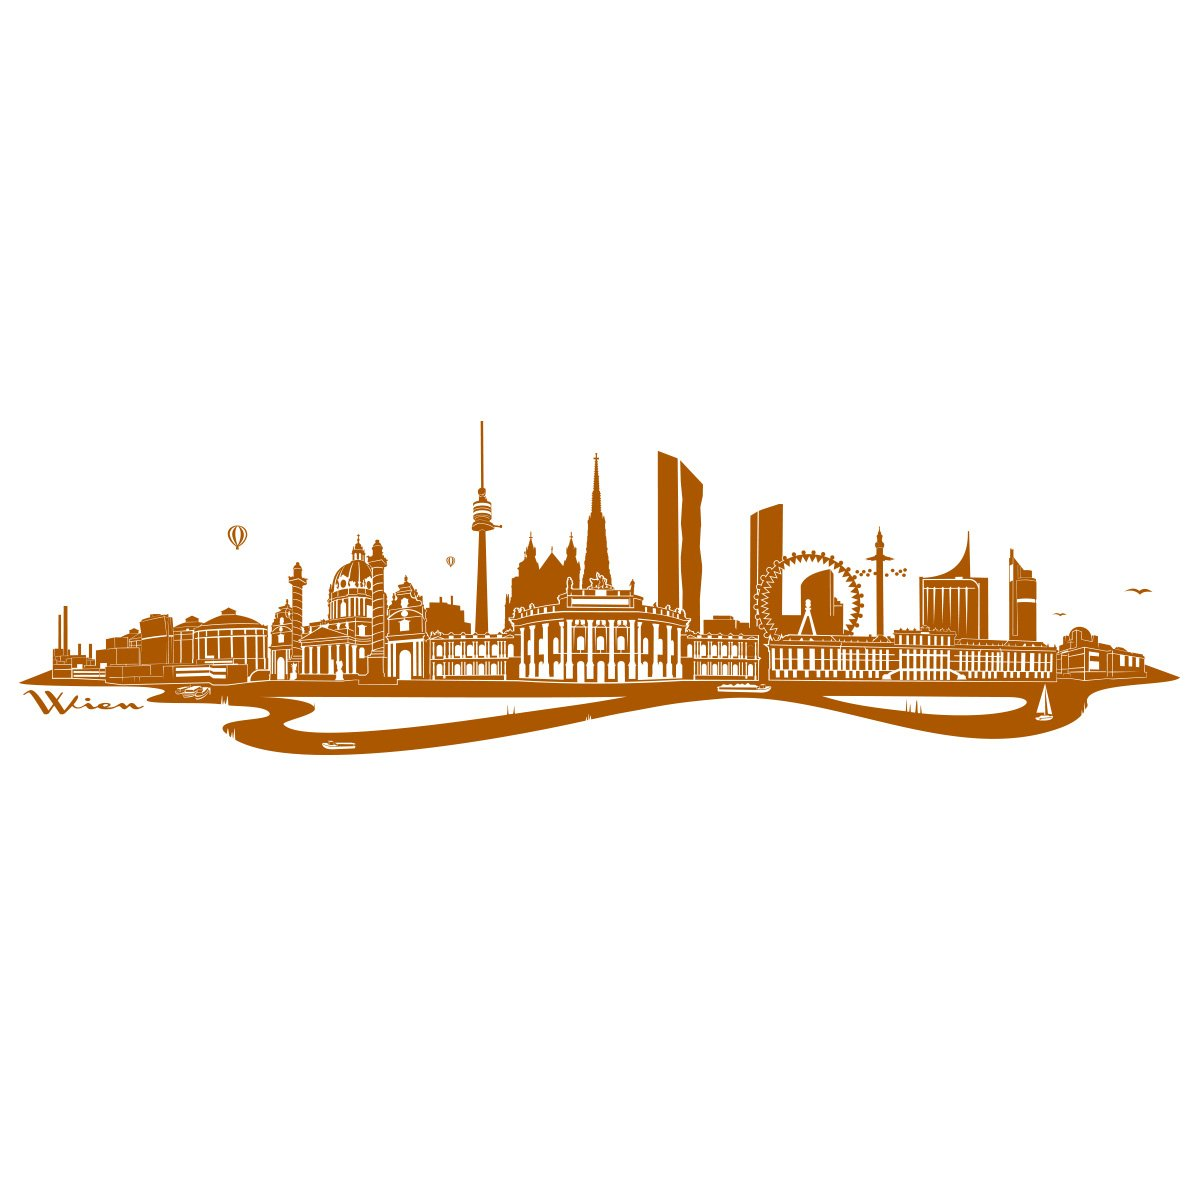 WANDKINGS Wandtattoo - Skyline Wien (mit Fluss) Fluss) Fluss) - 300 x 86 cm - Mittelgrau - Wähle aus 6 Größen & 35 Farben B078SH4WQJ Wandtattoos & Wandbilder 5ed6c7